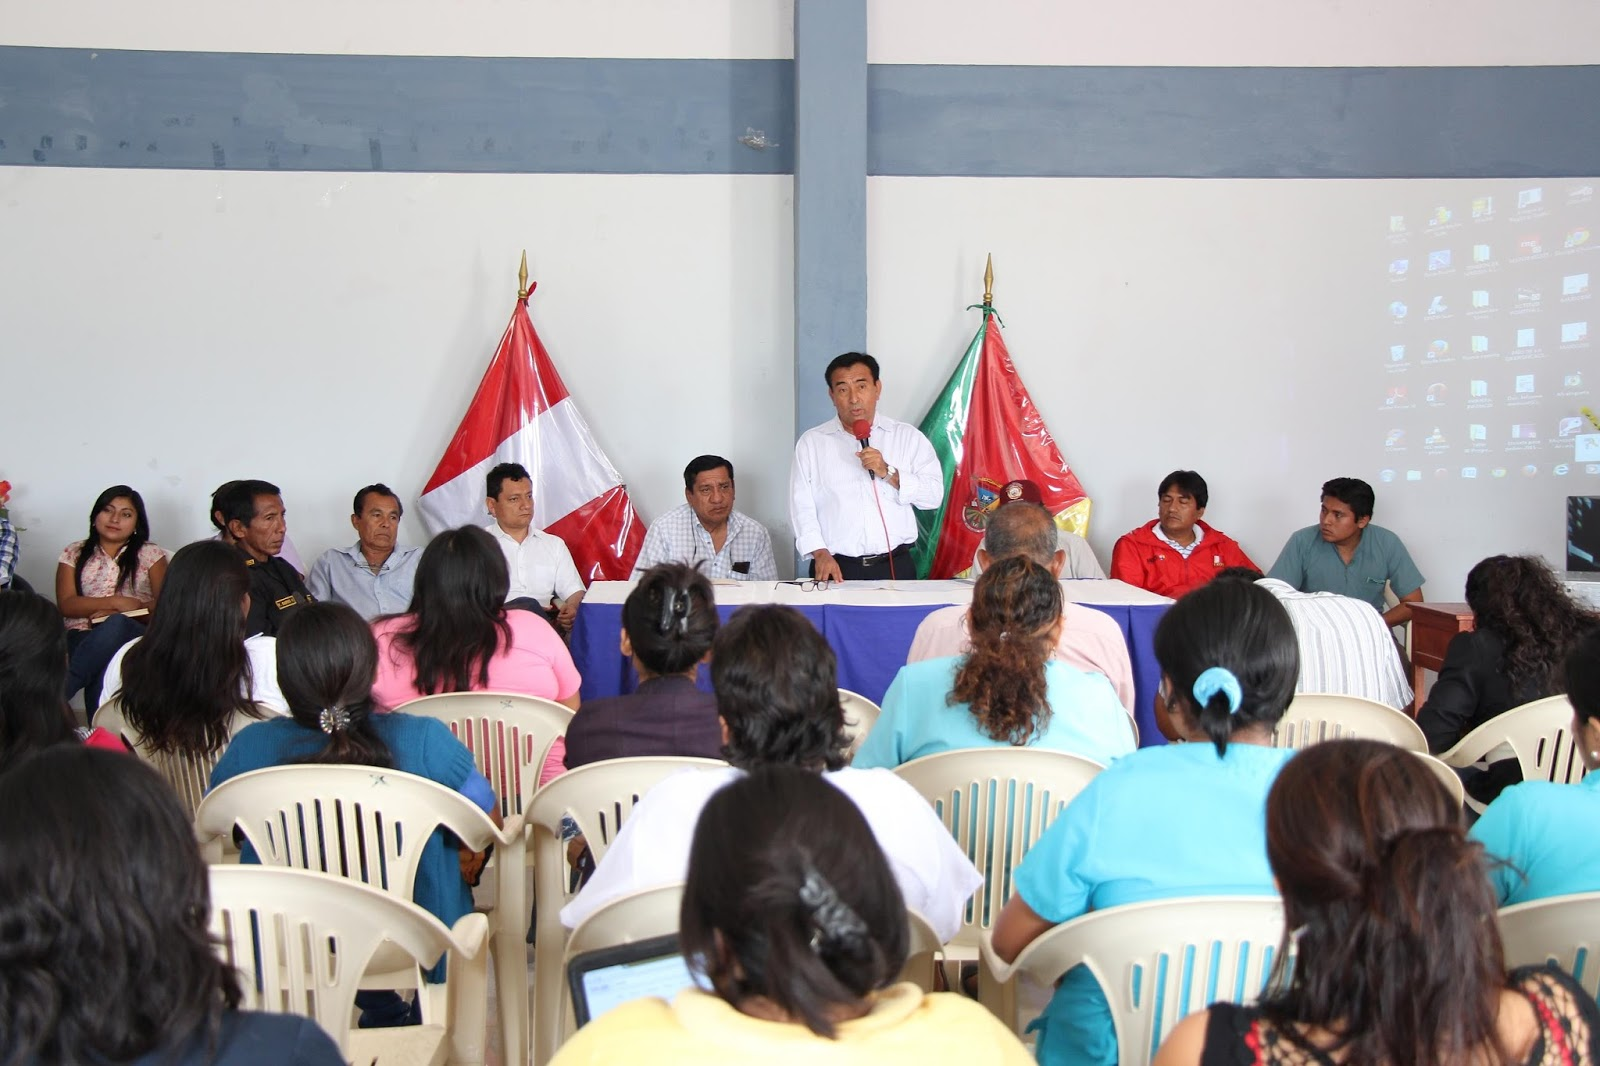 Municipalidad distrital de la matanza convoca a for Municipalidad la matanza